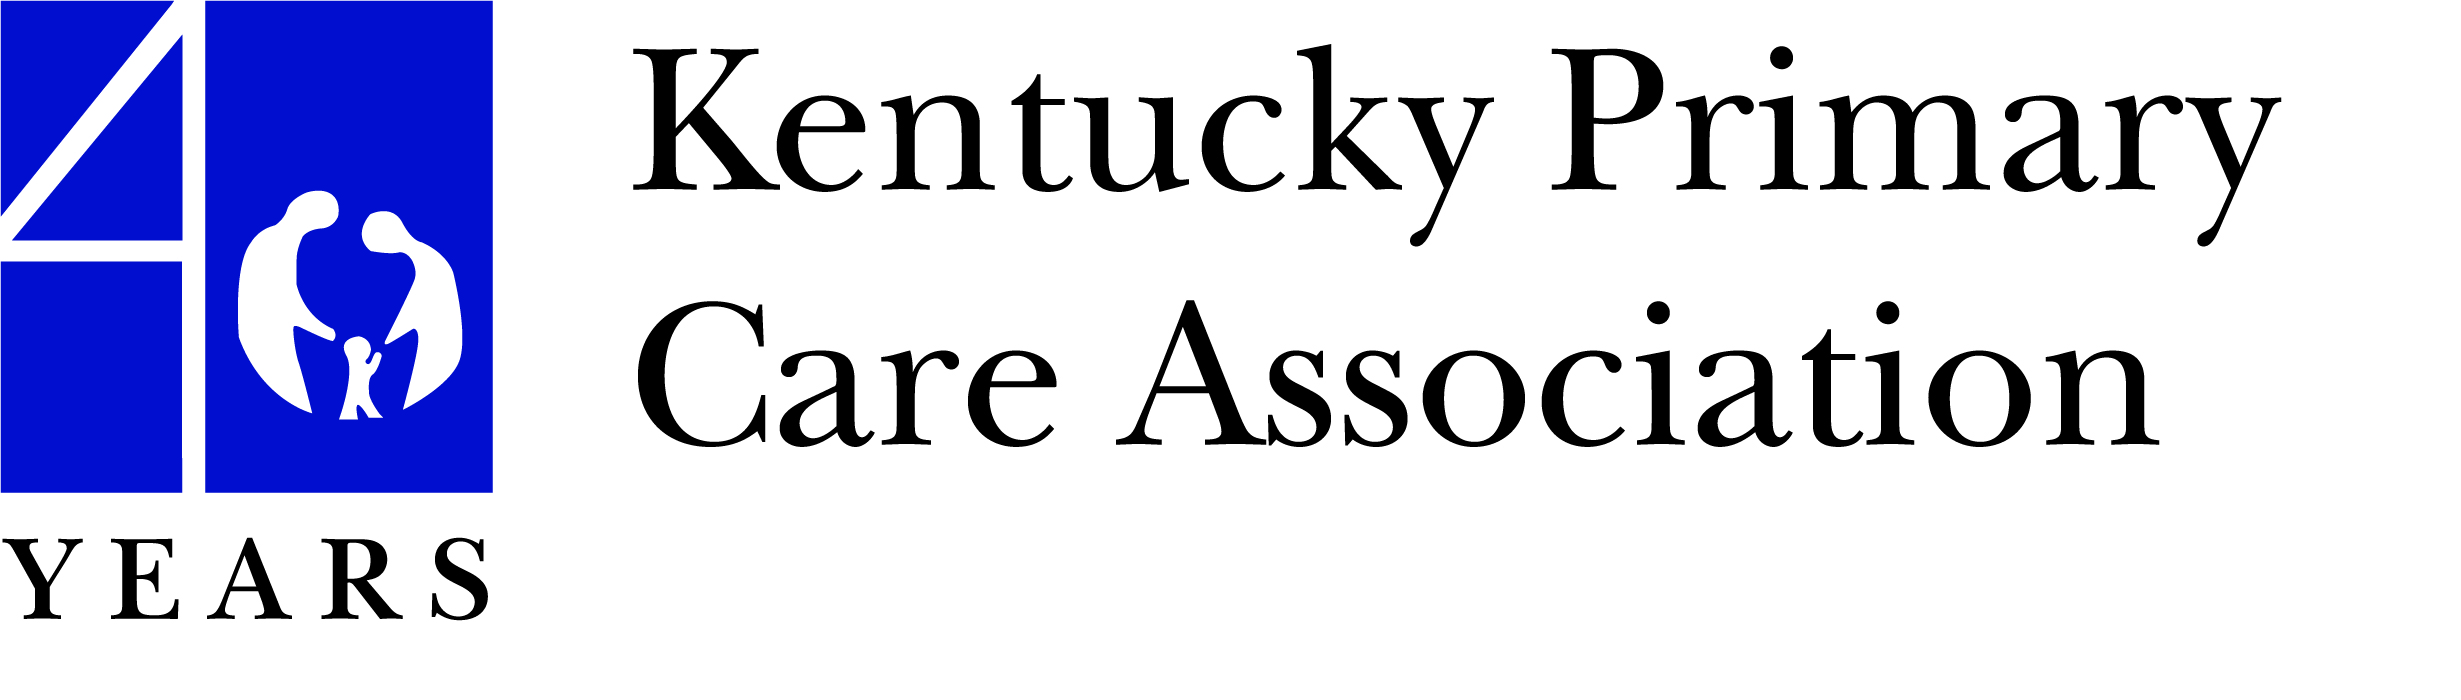 kentucky_primary_care_association.jpg